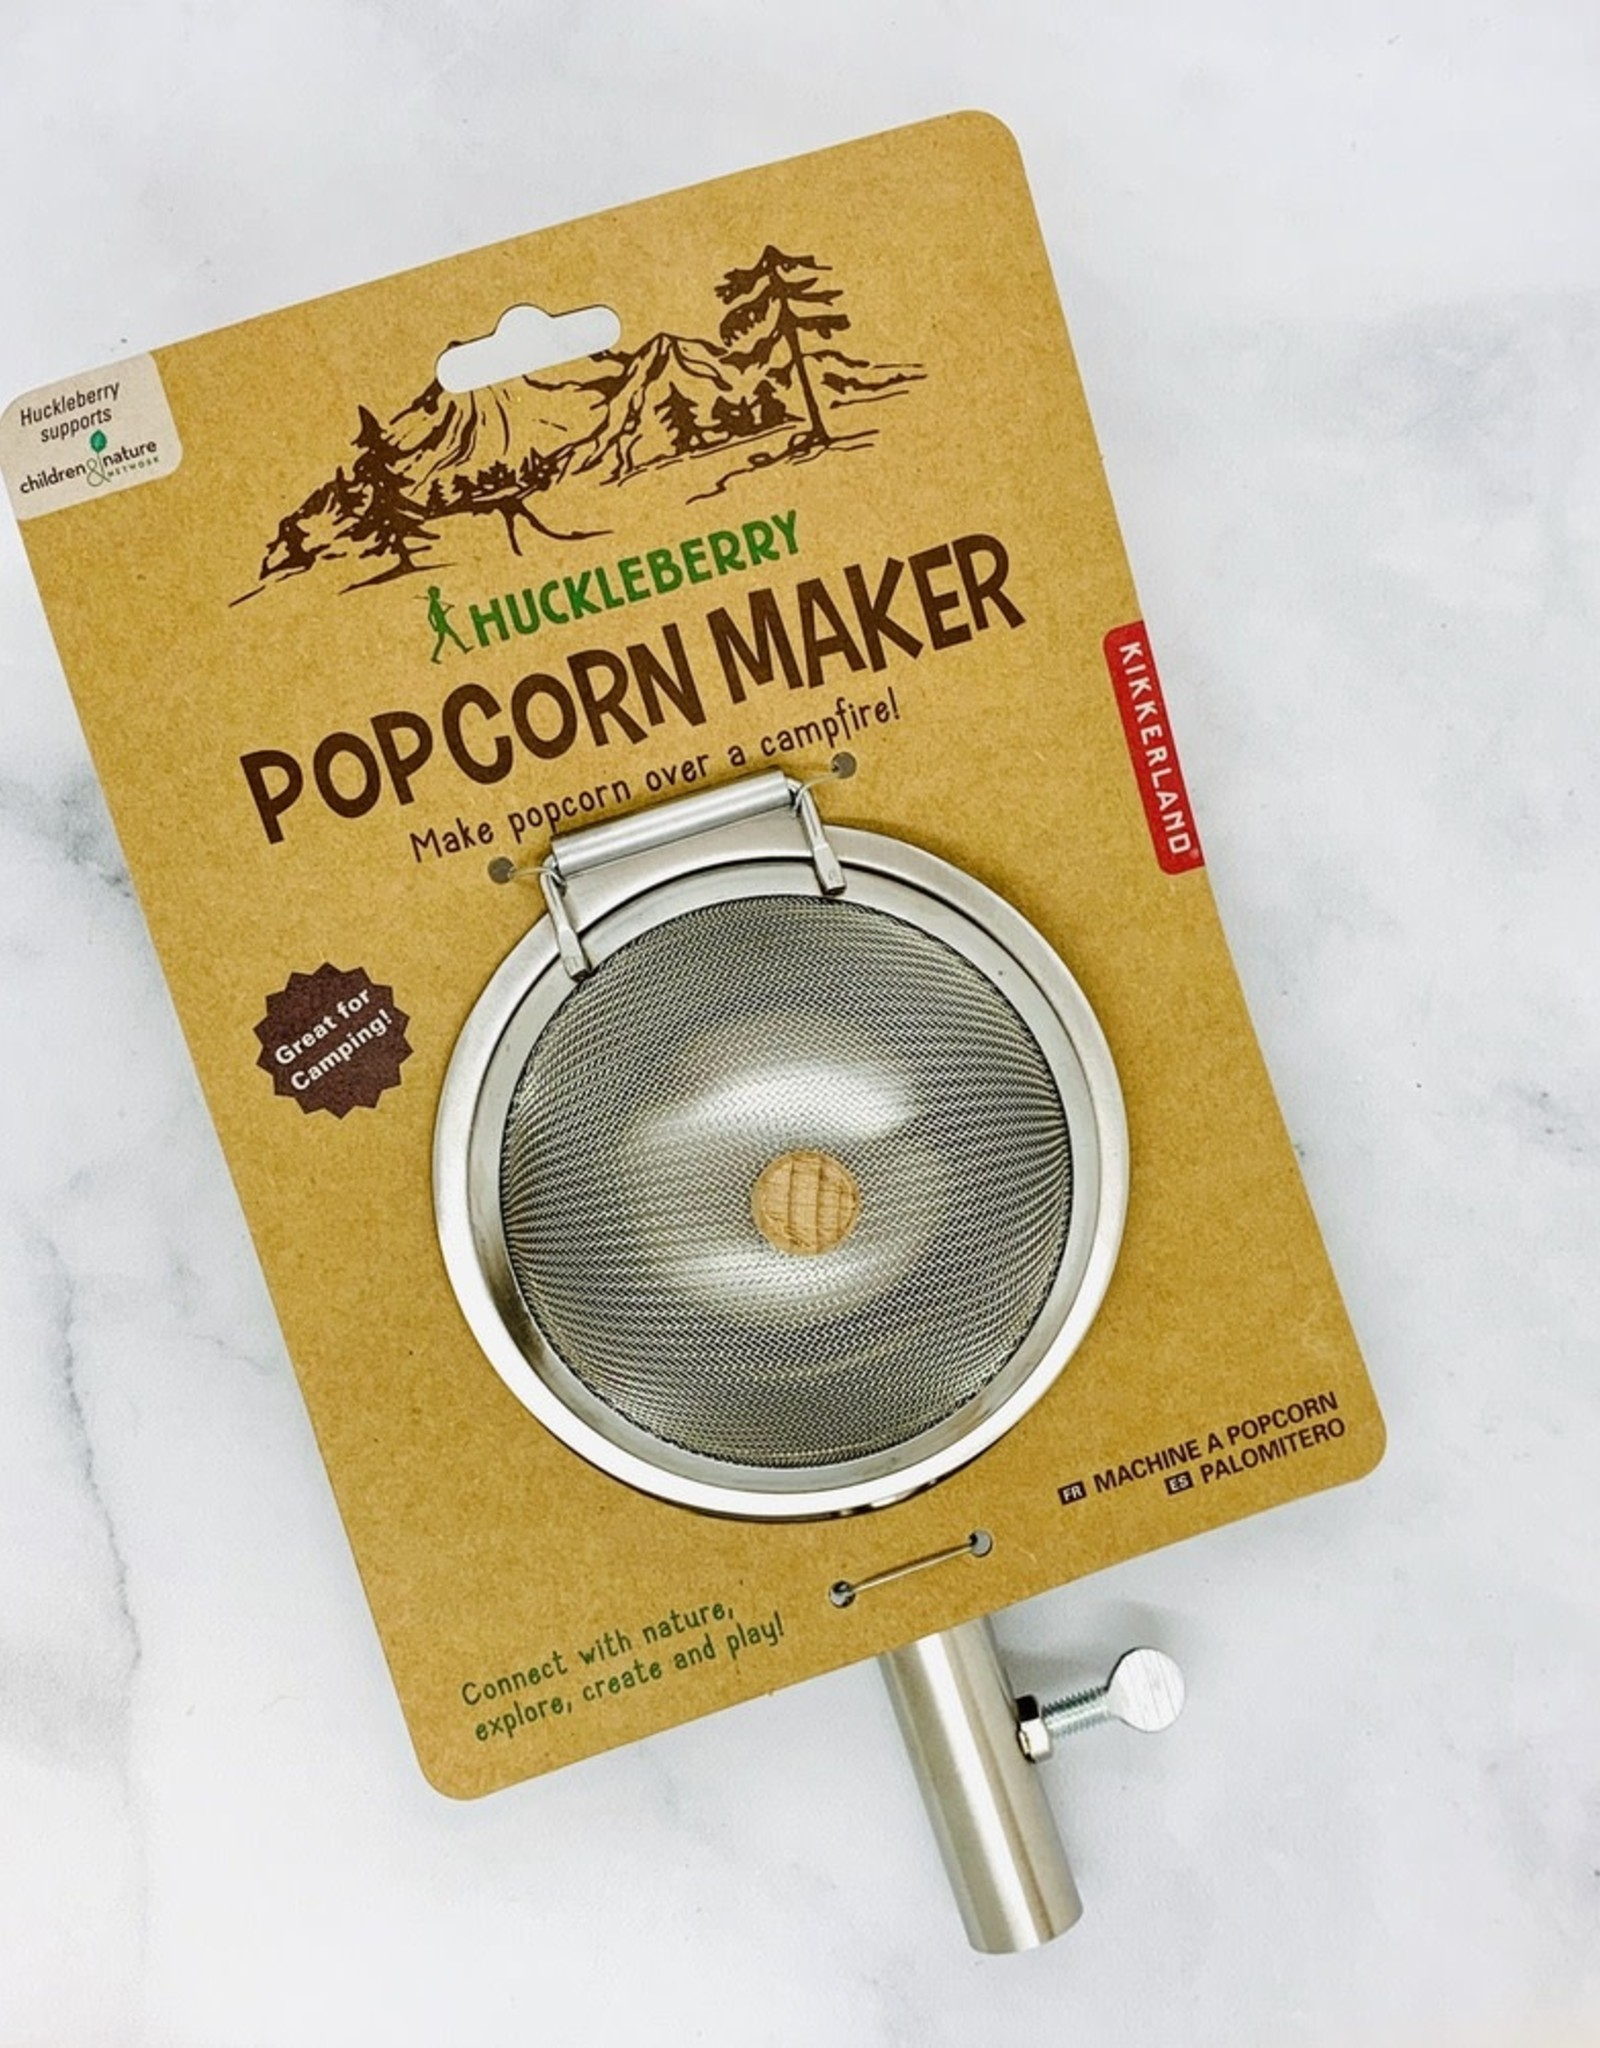 Huckleberry Popcorn Maker